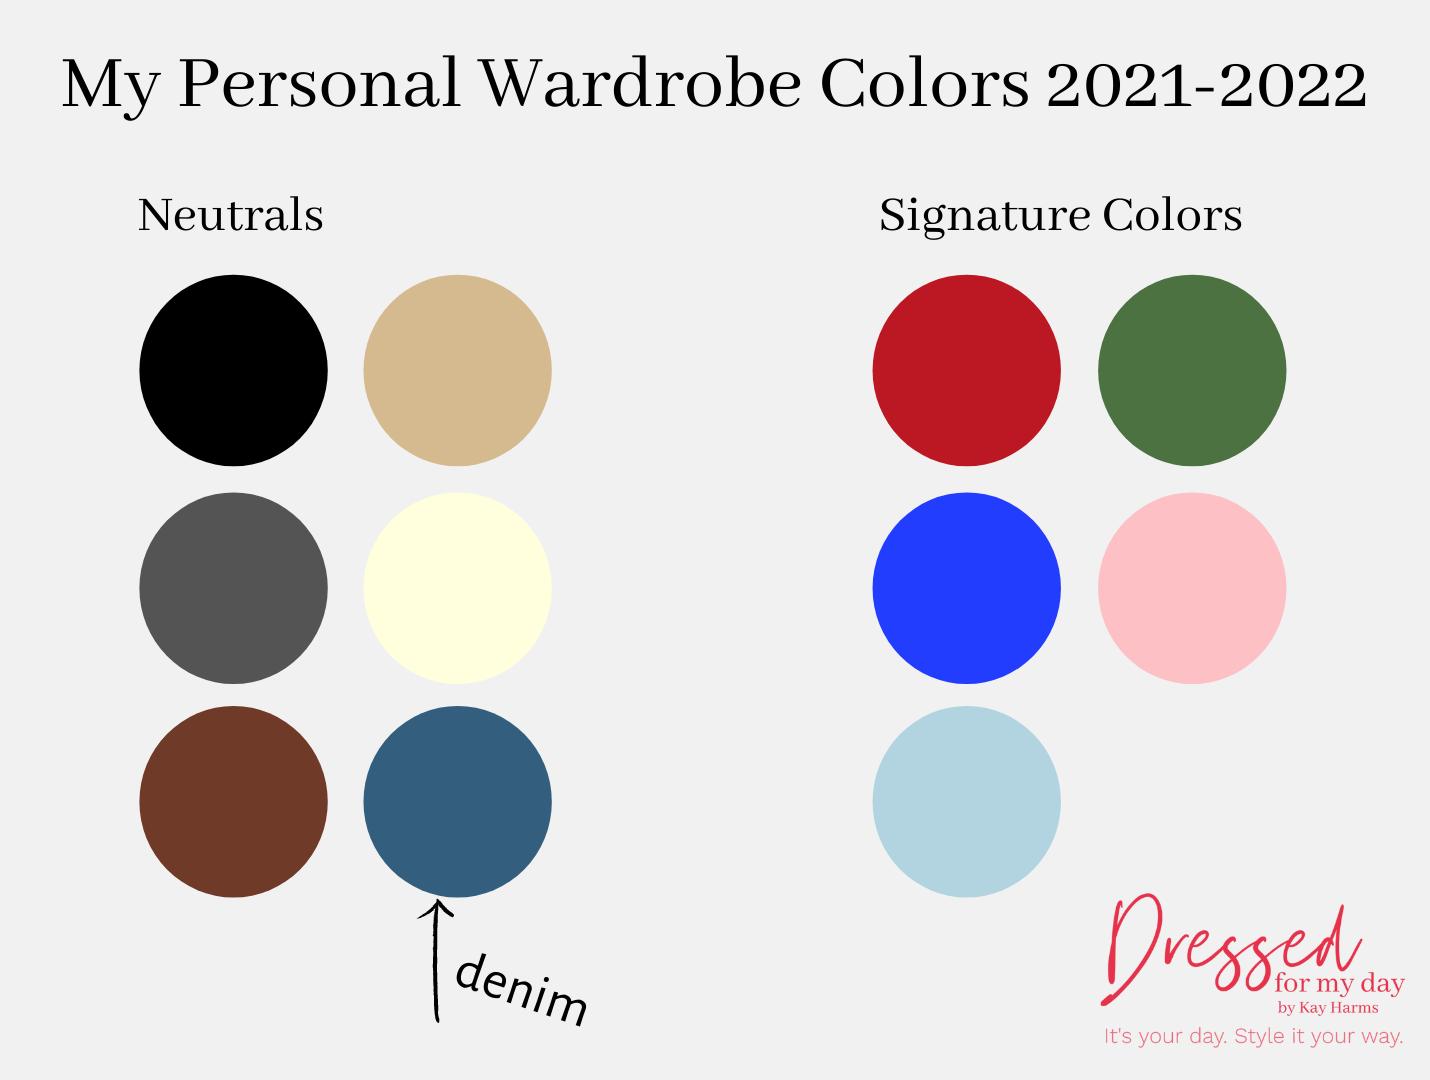 My Personal Wardrobe Colors 2021-2022